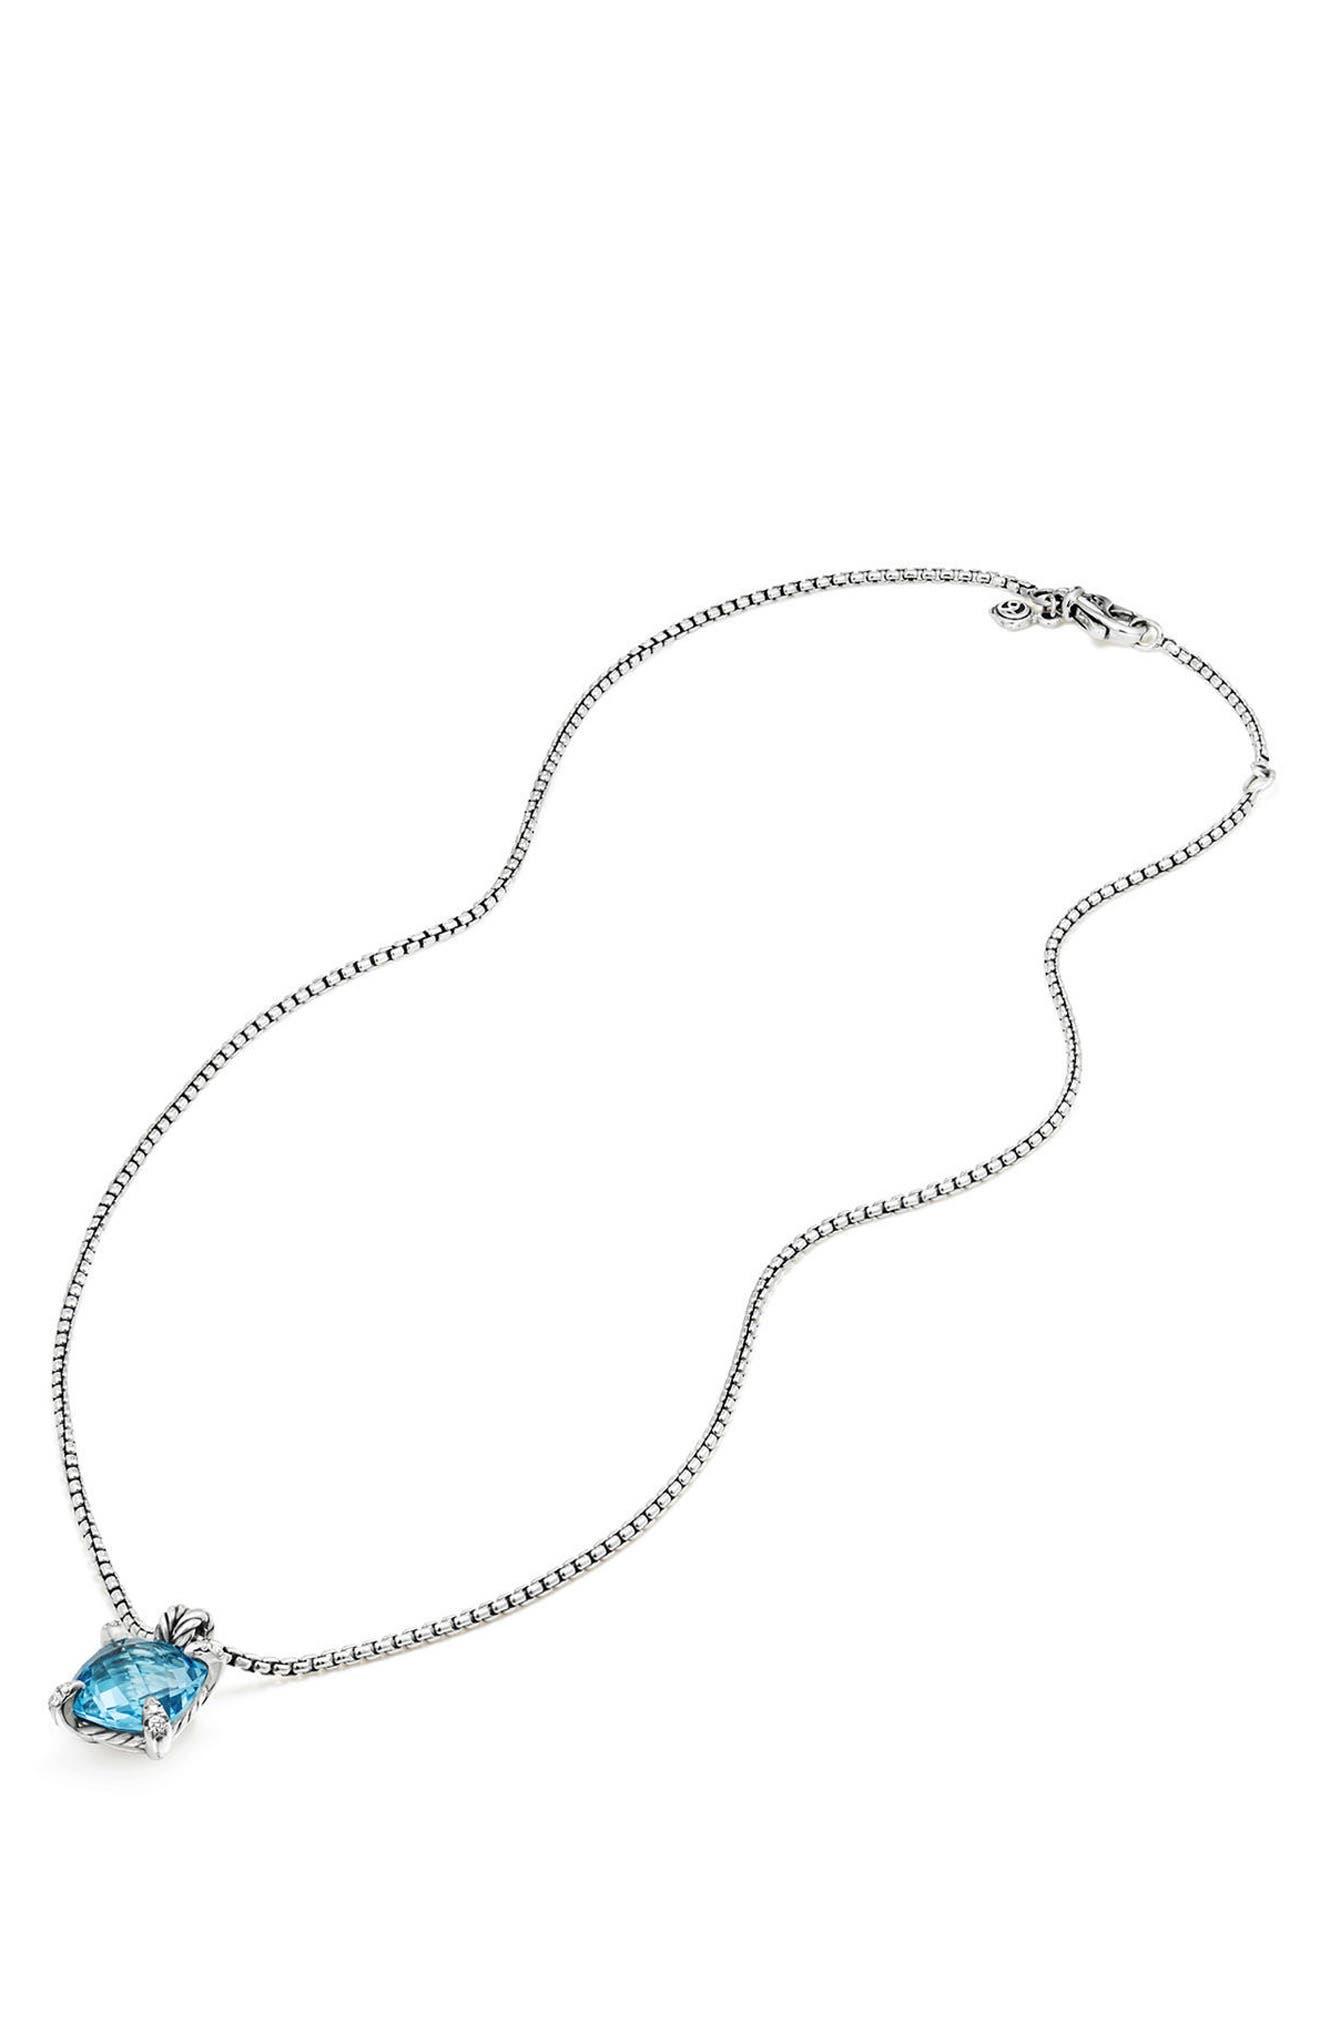 Châtelaine Pendant Necklace with Semiprecious Stone & Diamonds,                             Alternate thumbnail 2, color,                             BLUE TOPAZ?